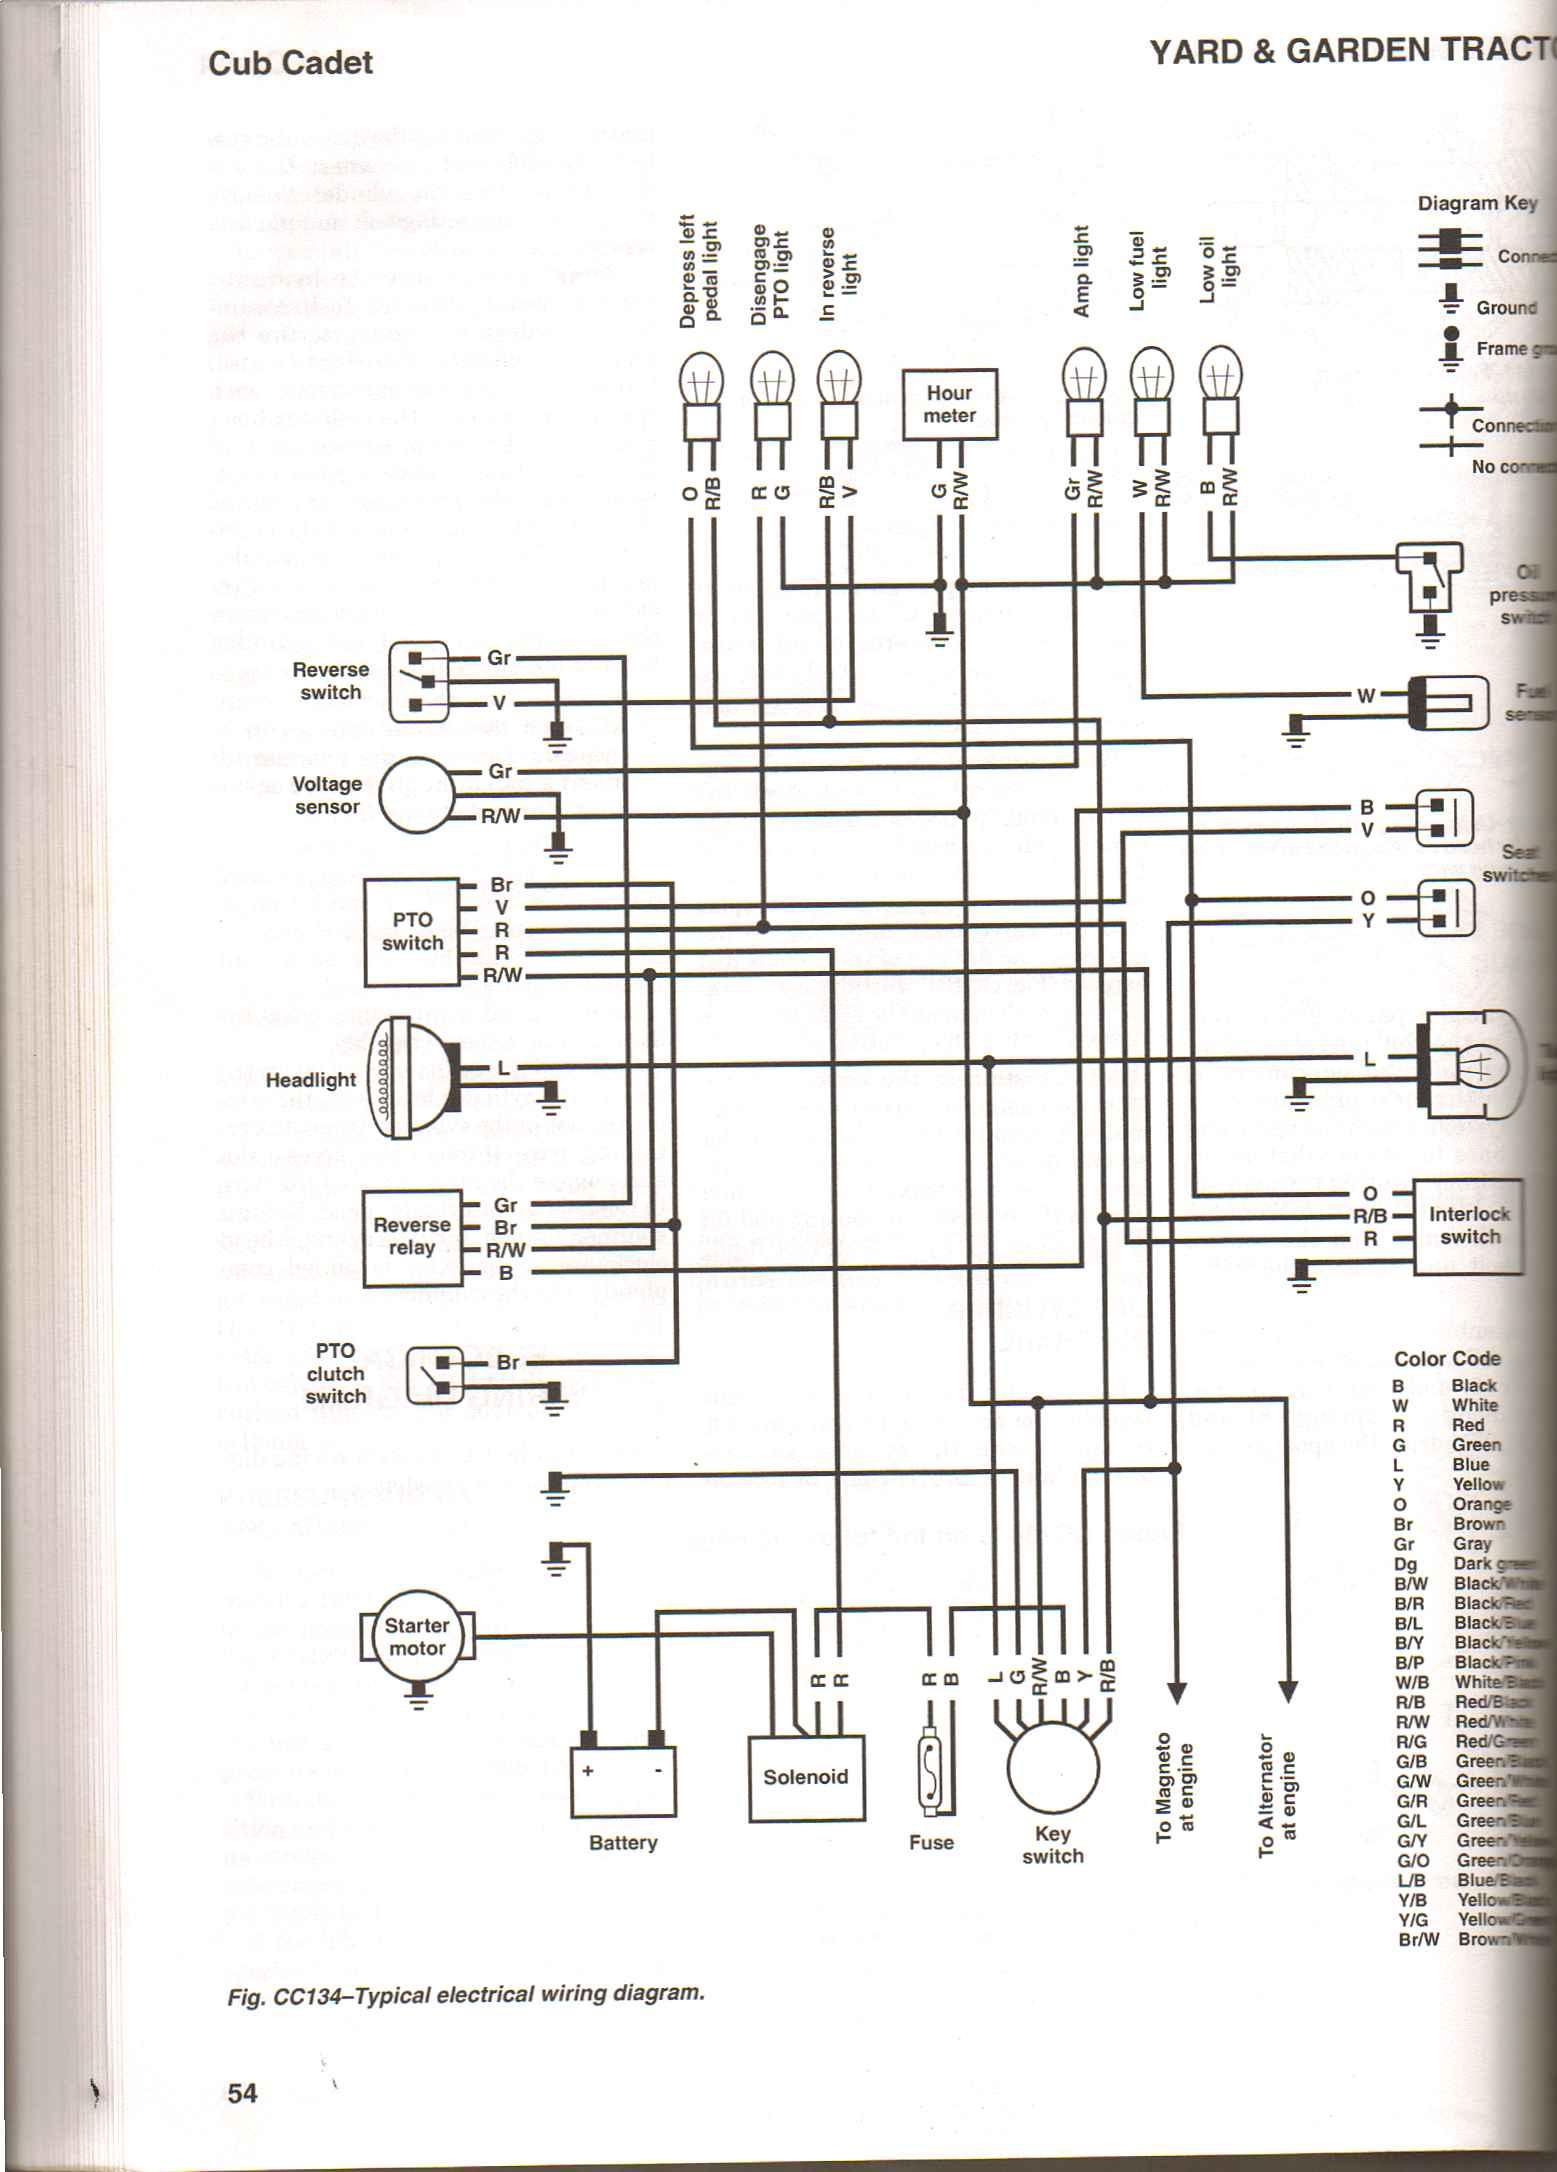 Wiring Diagram Cub Cadet Lt 1550